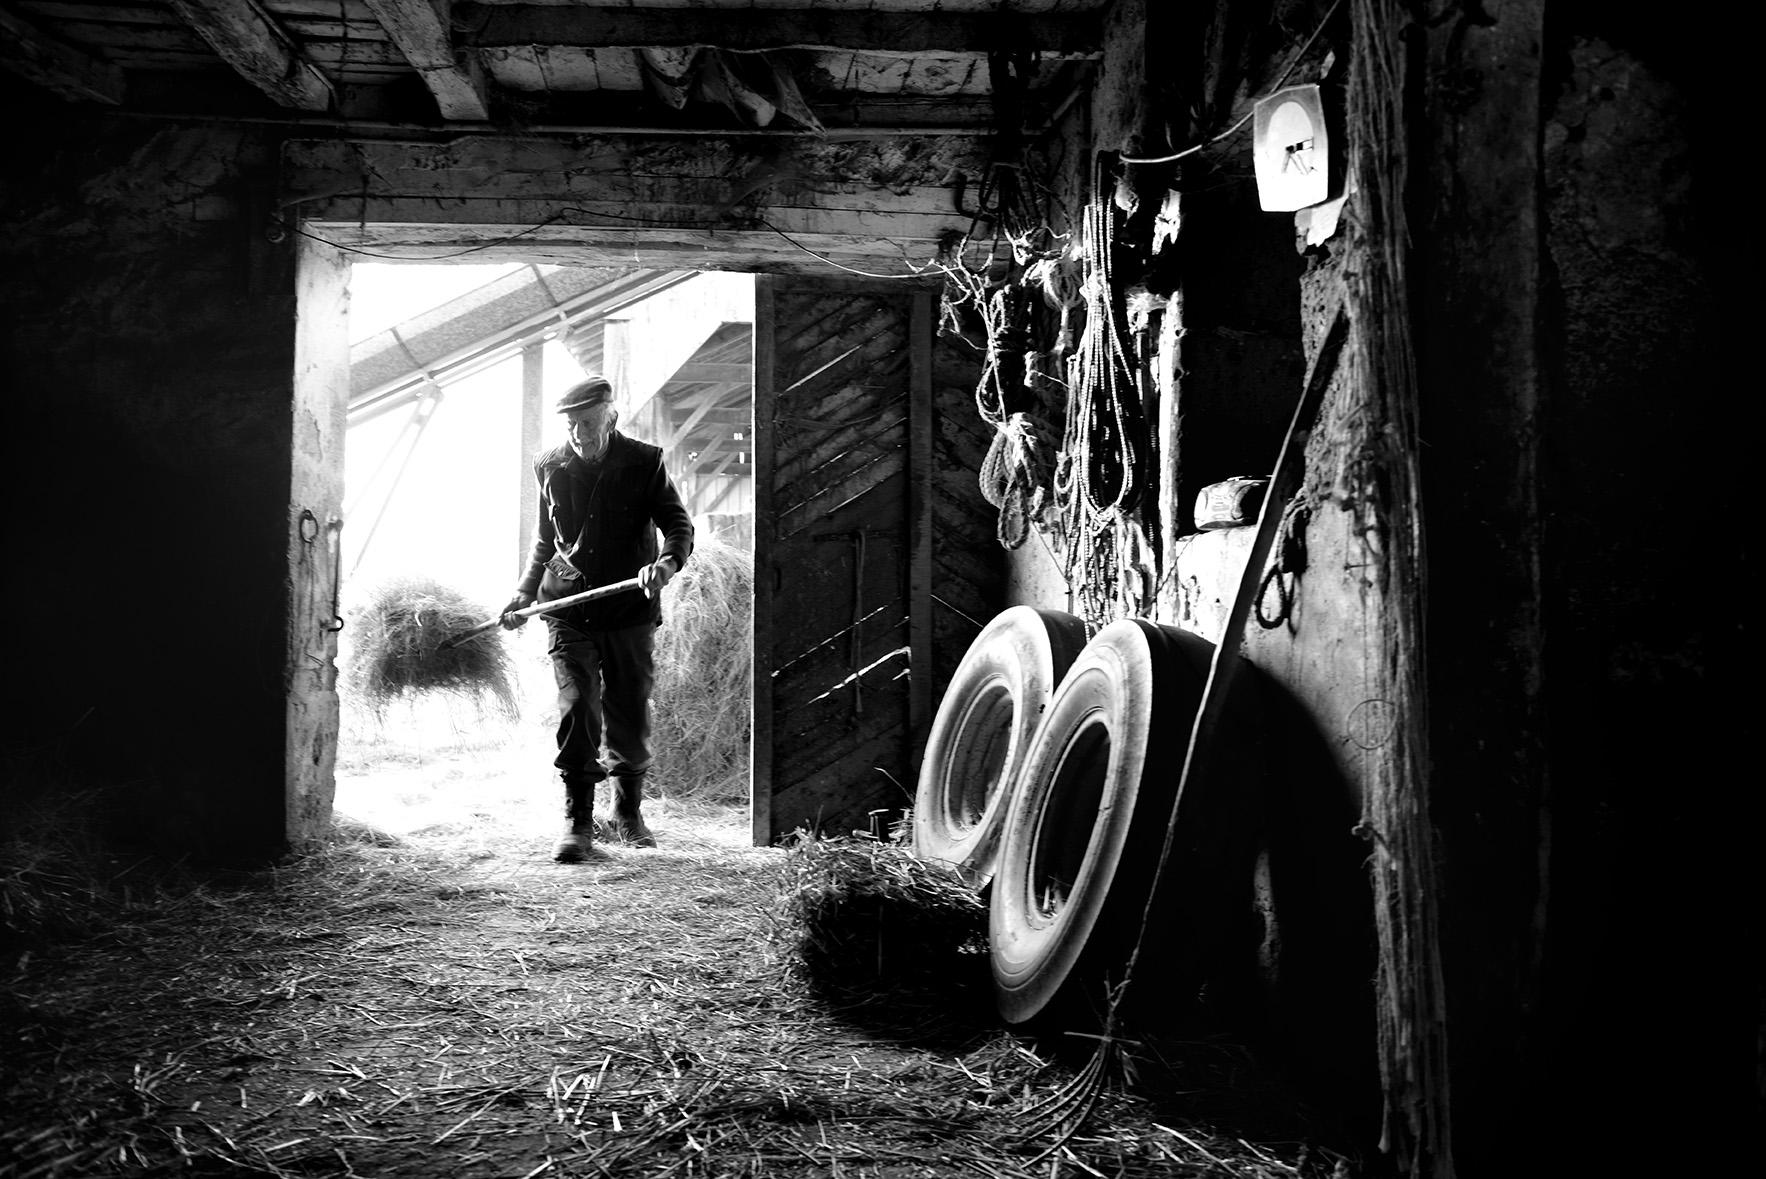 Charney Magri A French farmers secret to longevity 4080 LR